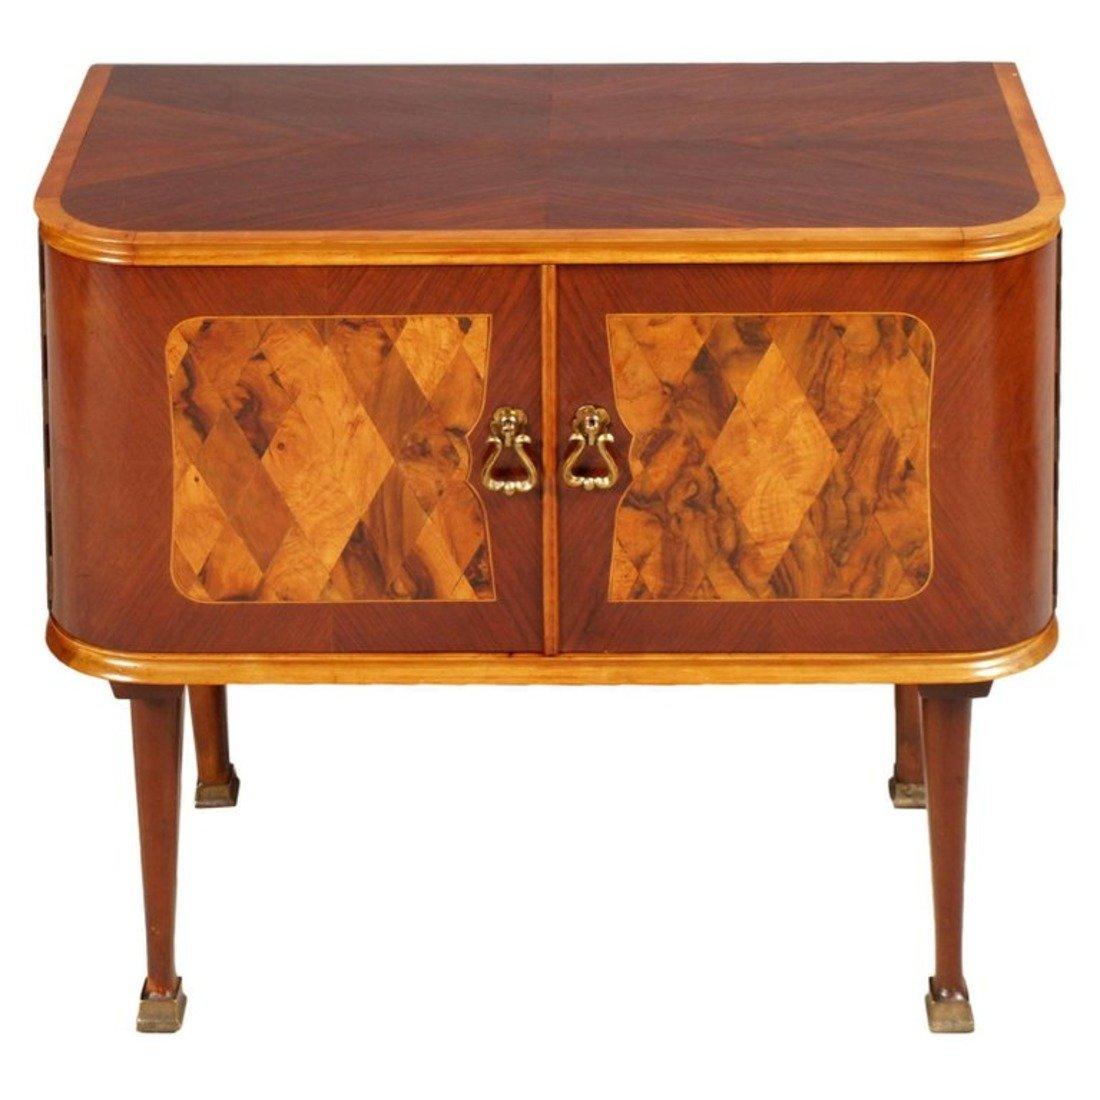 Mid Century Art Deco Walnut Burl Inlaid Nightstands From Consorzio